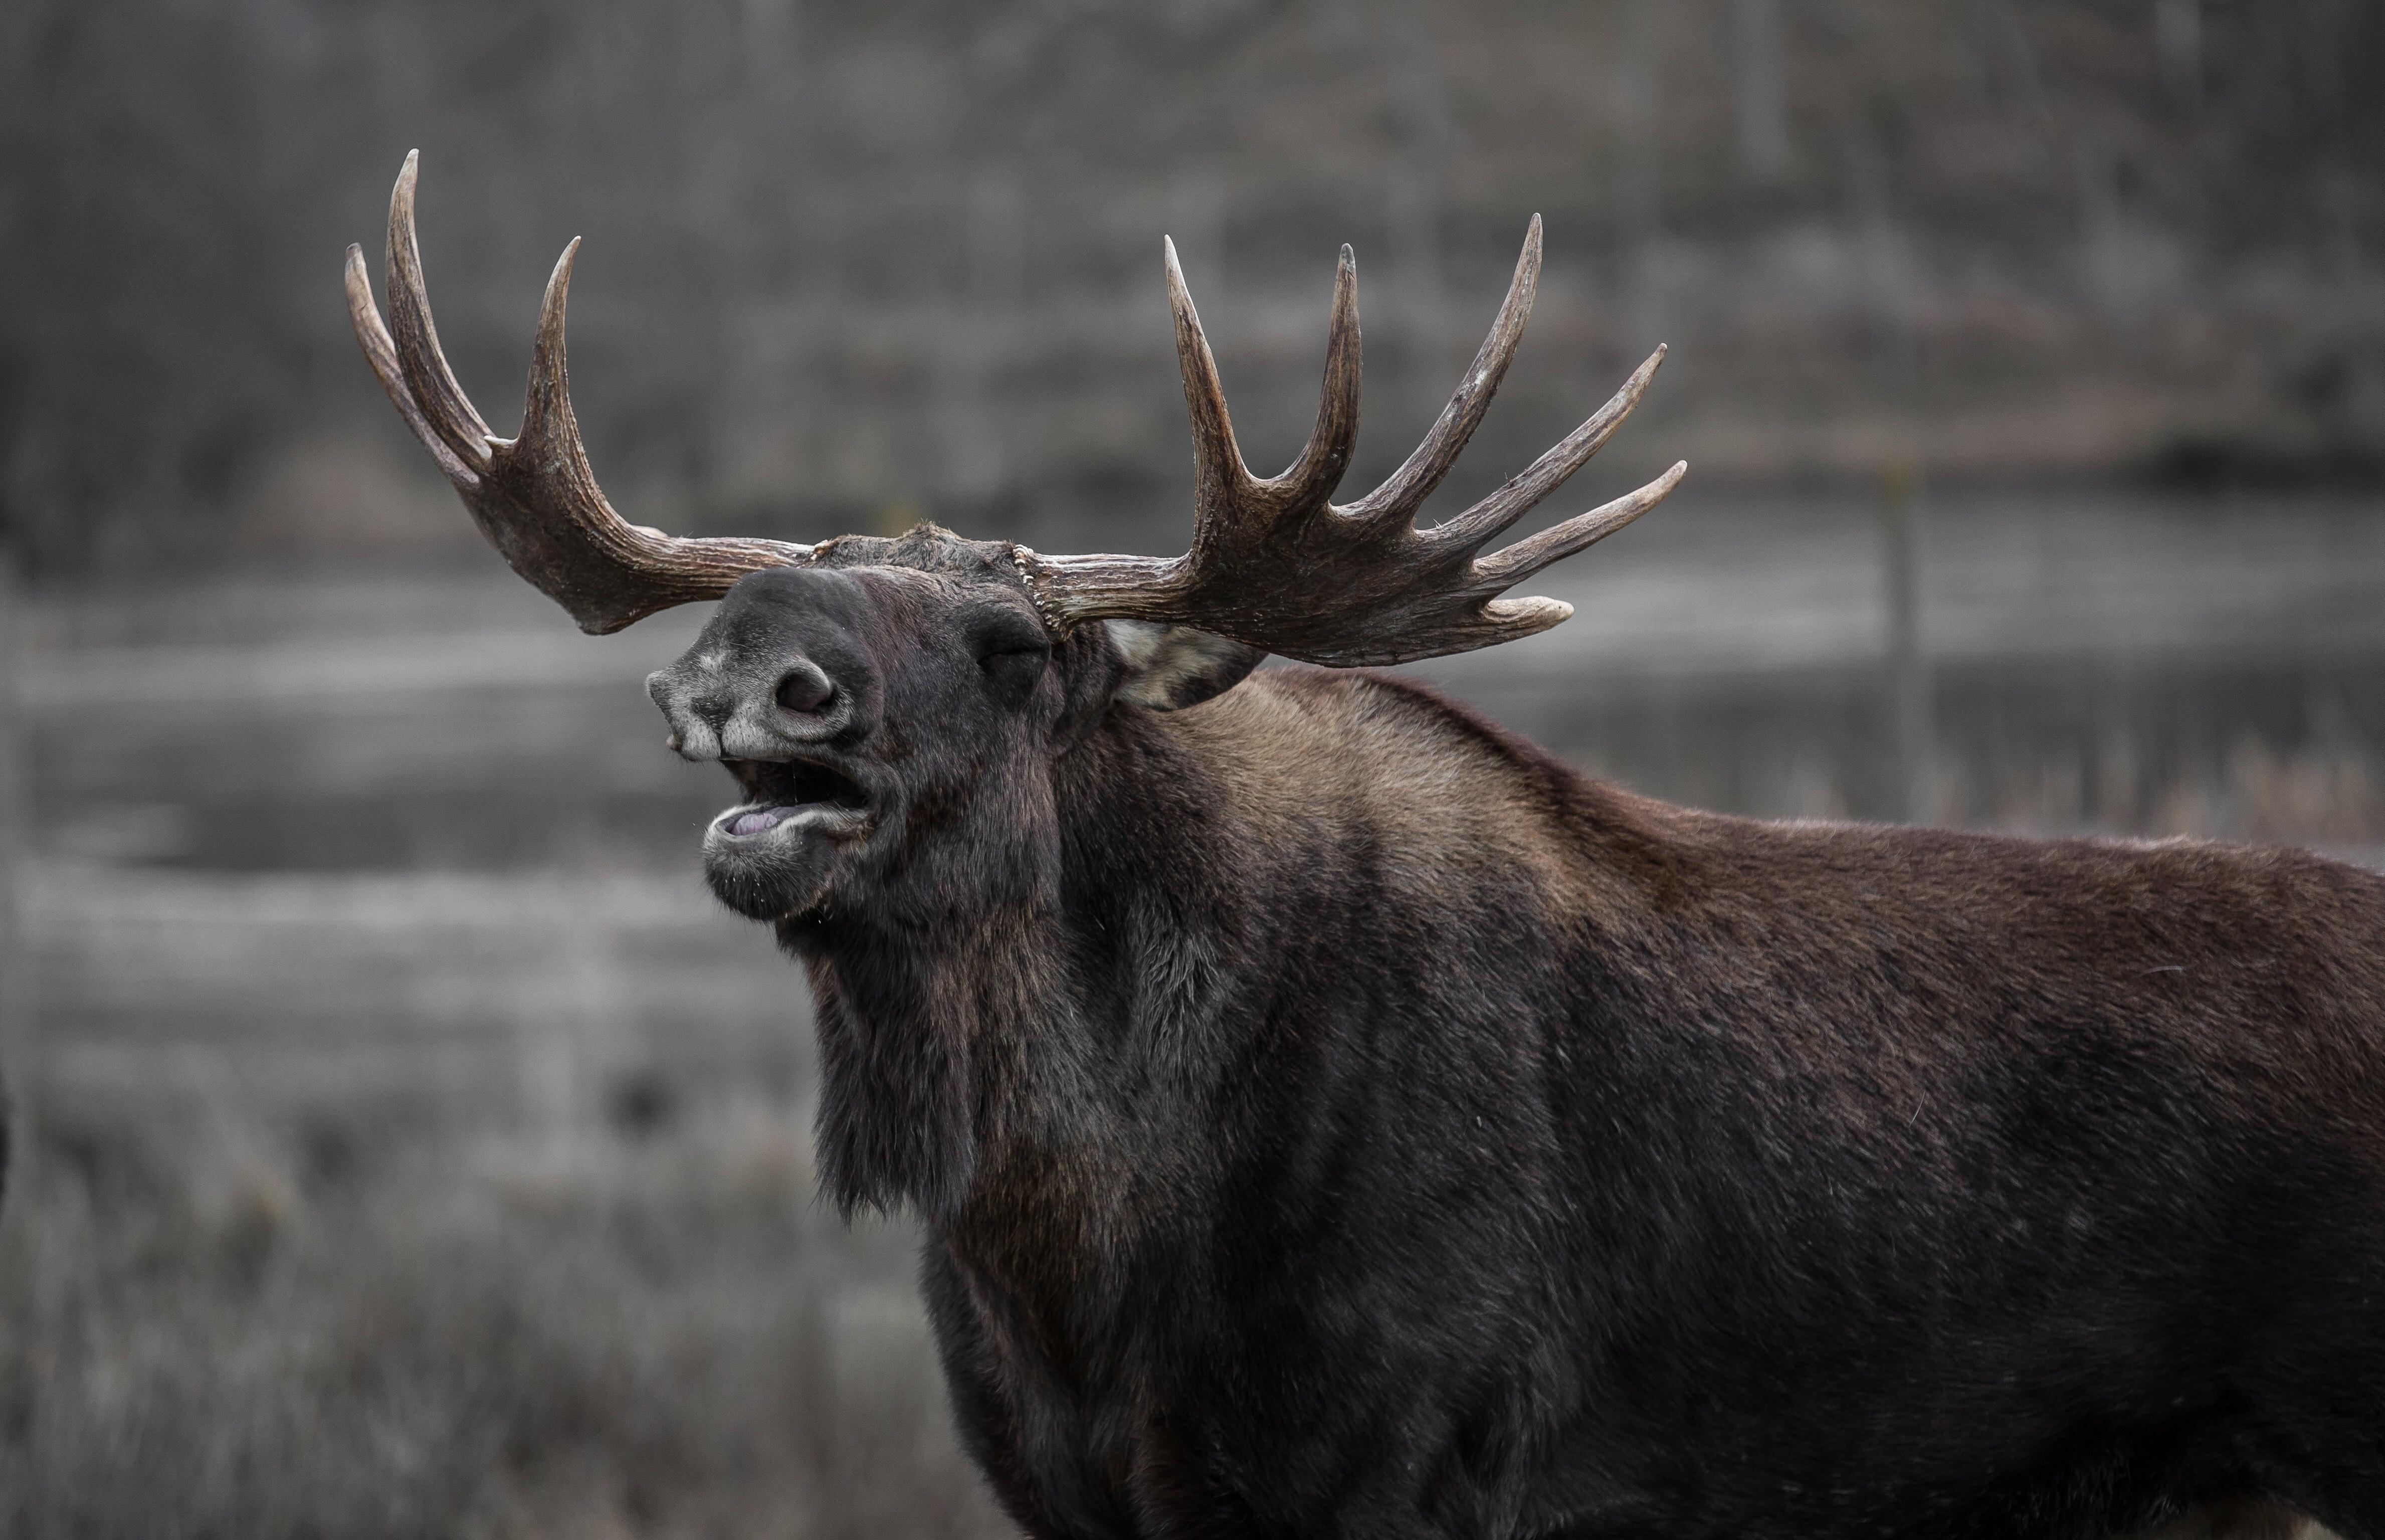 animal-animal-photography-close-up-39645